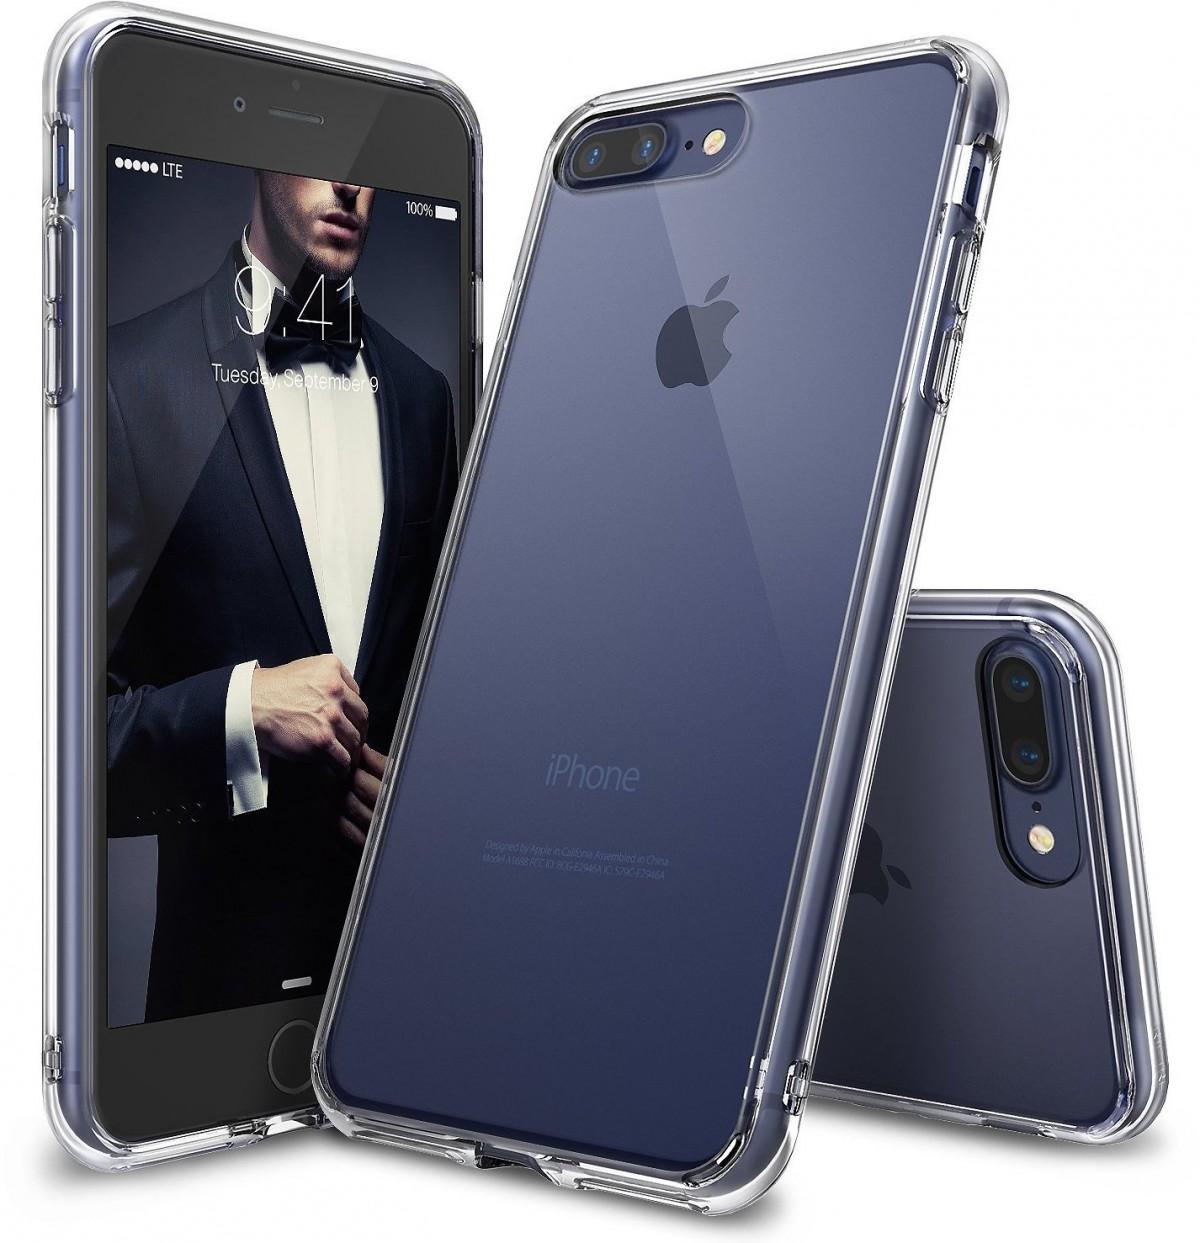 Průhledný čirý obal / kryt na iPhone 7 Plus